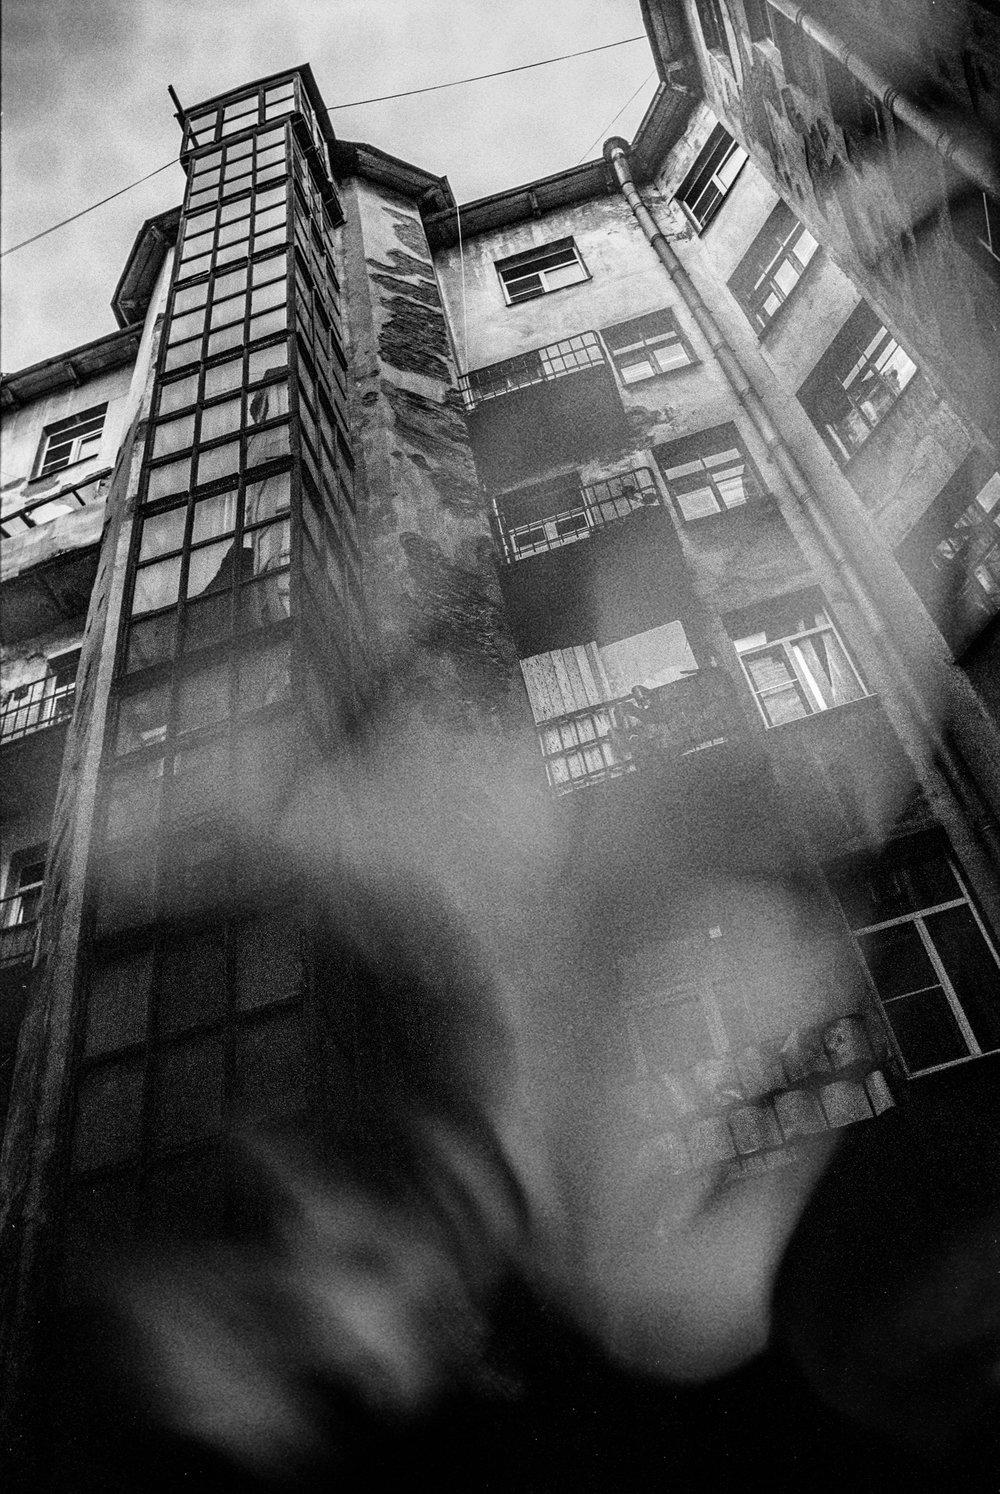 Demon Downcast | Minolta XD | Nikolay Proleyev